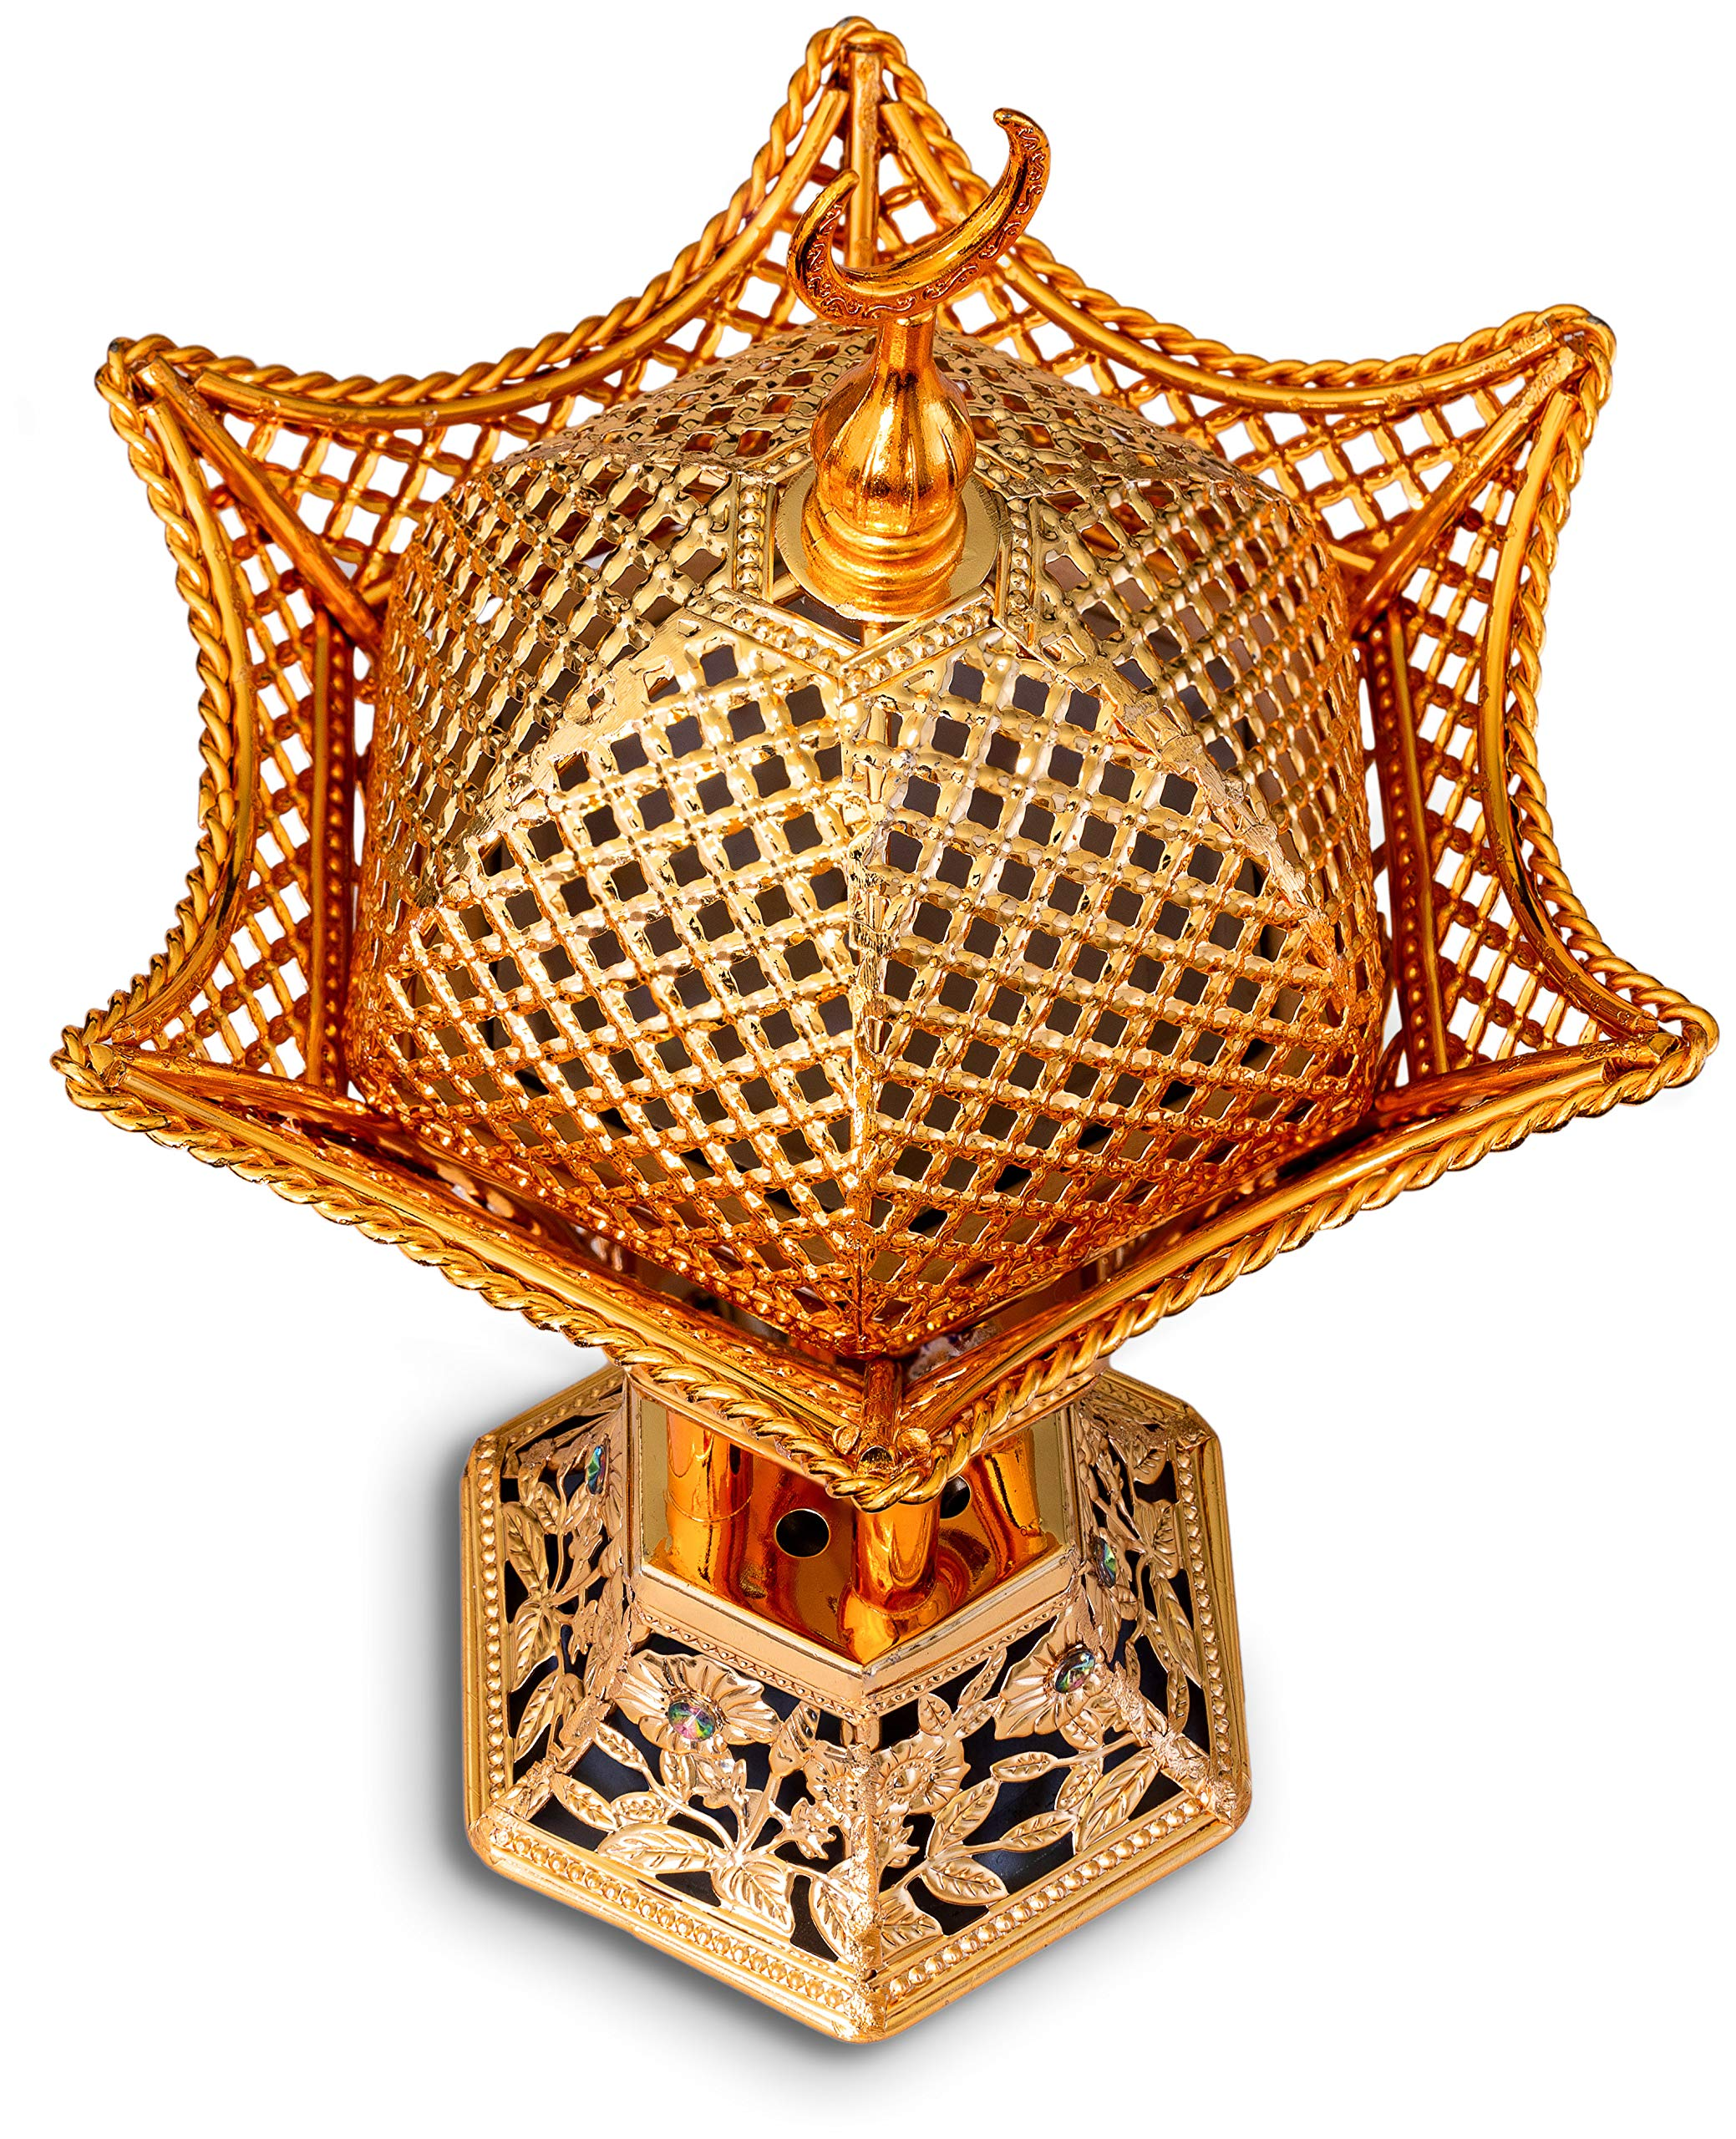 AM Bakhoor Charcoal Incense Burner - Oud Frankincense Resin Burner 10.5 Inches Tall - for Bakhoor Oud Incense Sticks Cones - Luxury Filigree, Gold by AM (Image #6)